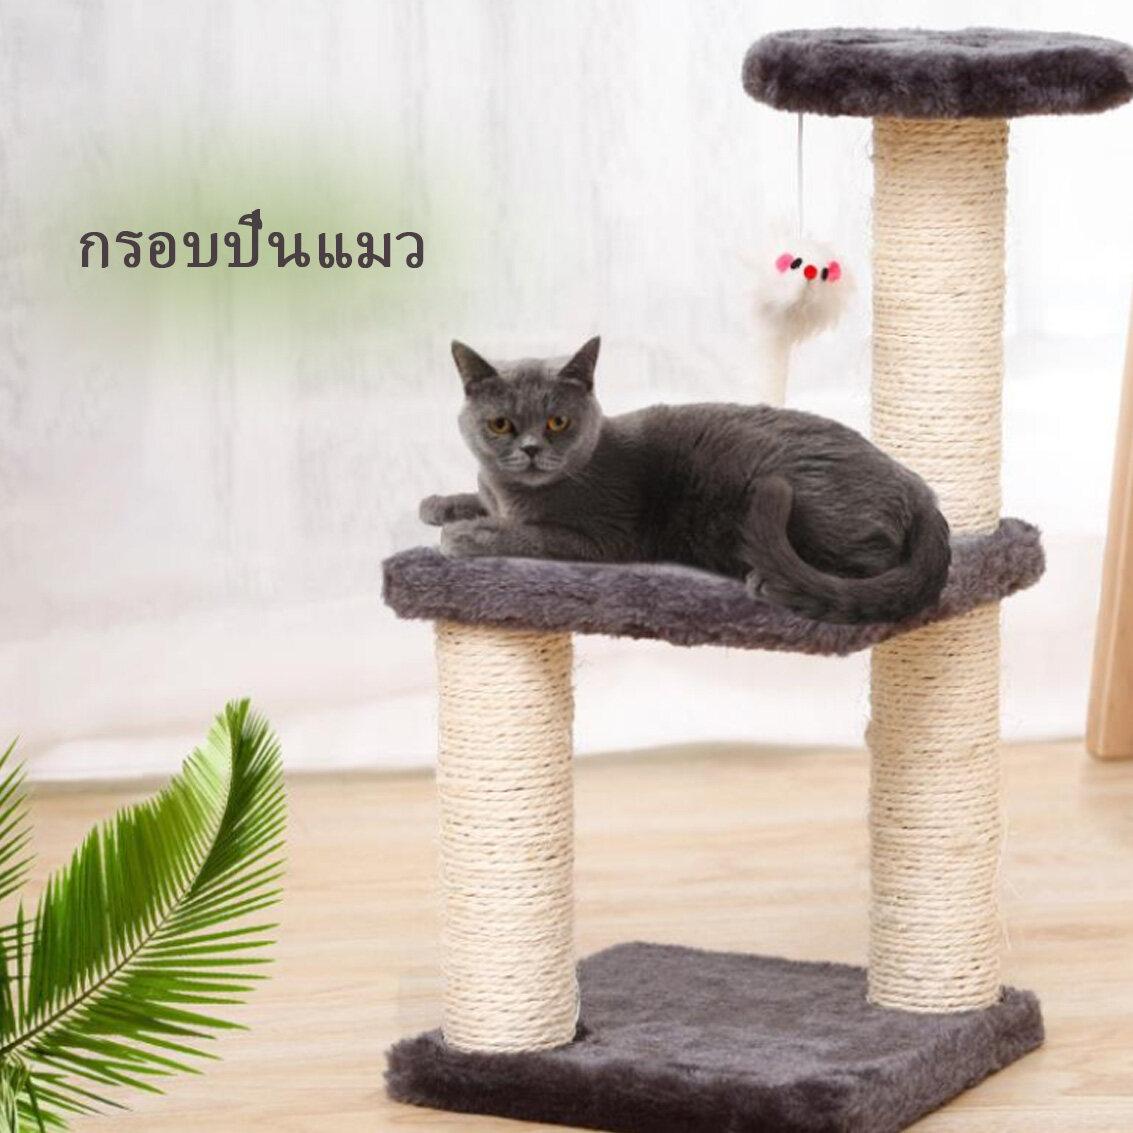 Yuanta คอนโดแมว 3 ชั้น ที่ลับเล็บแมว คอนโดแมวปีน ของเล่นสำหรับน้องแมว Cat Climbing Frame.